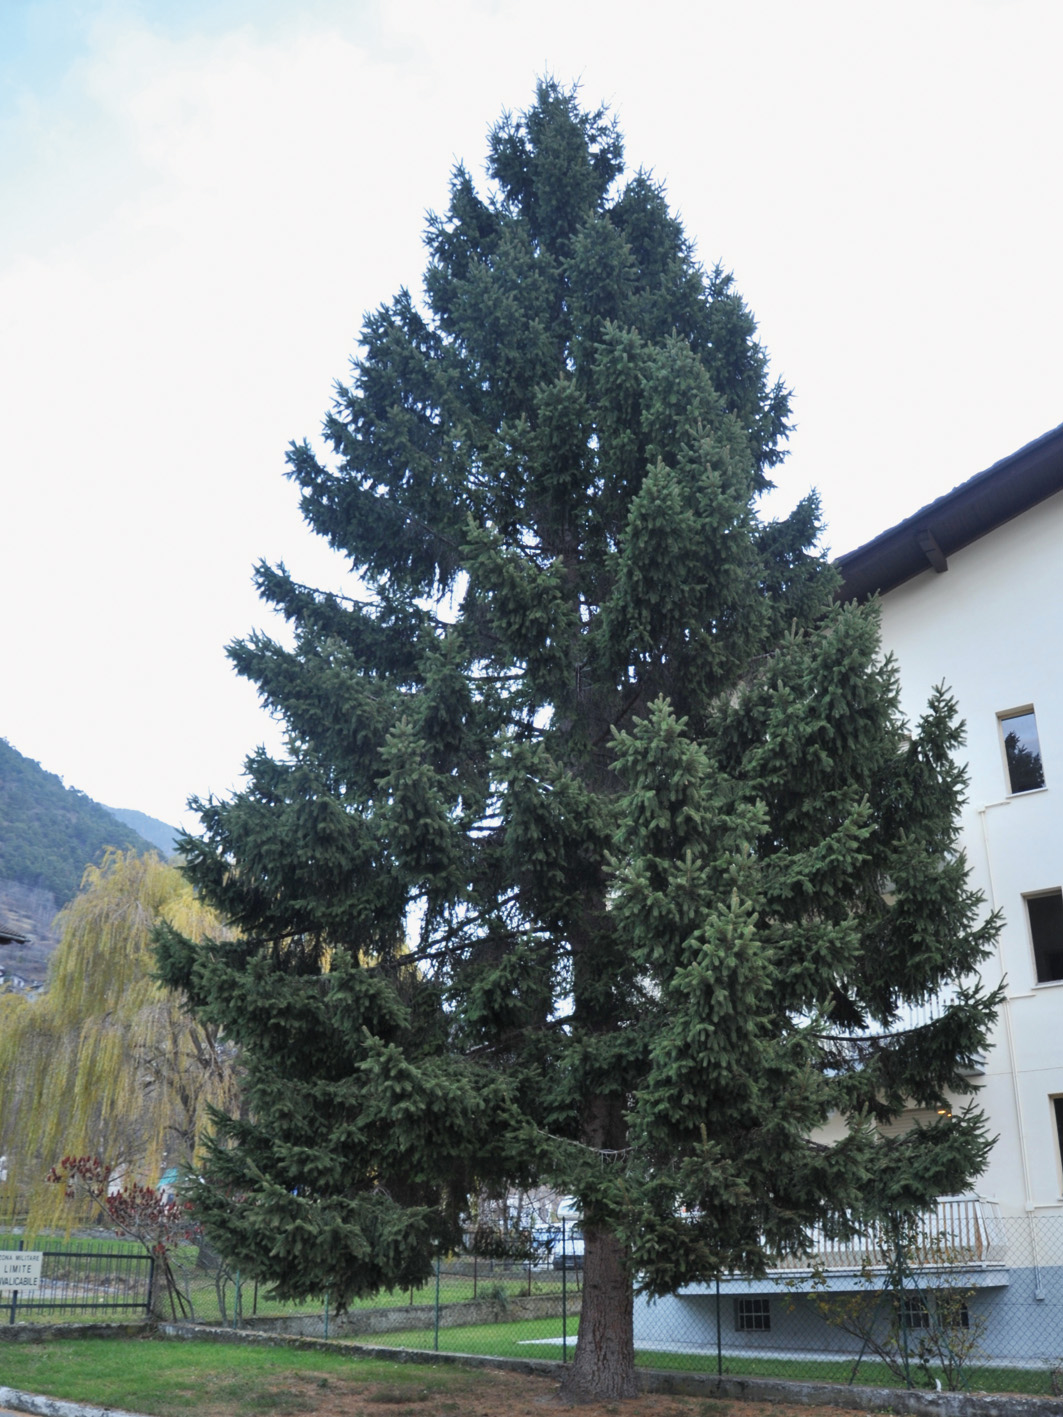 Donazione di alberi di natale all'aquila